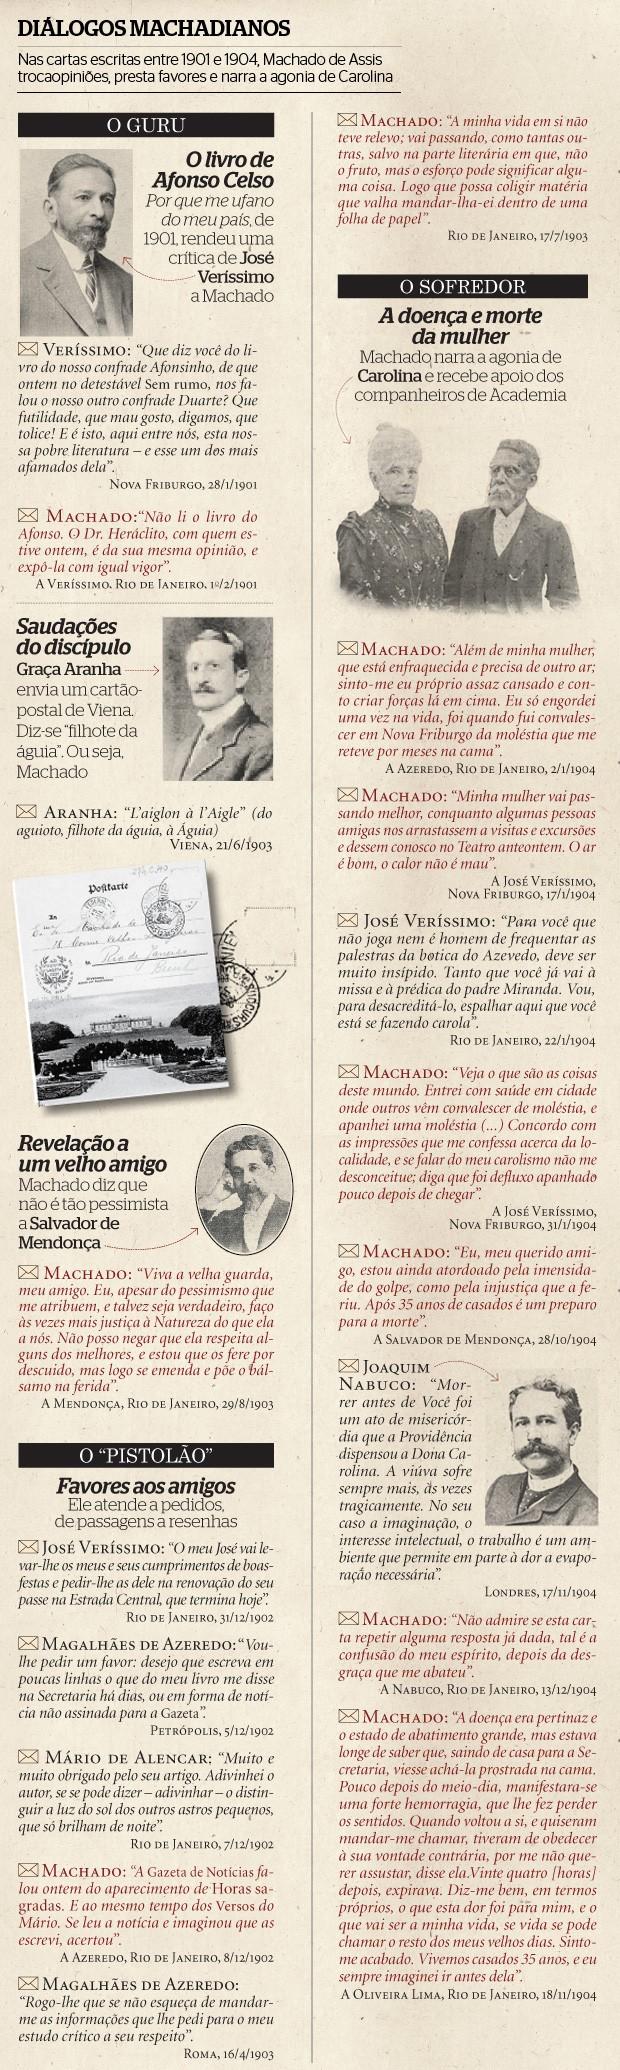 Diálogos machadianos (Foto: Acervo/ABL)